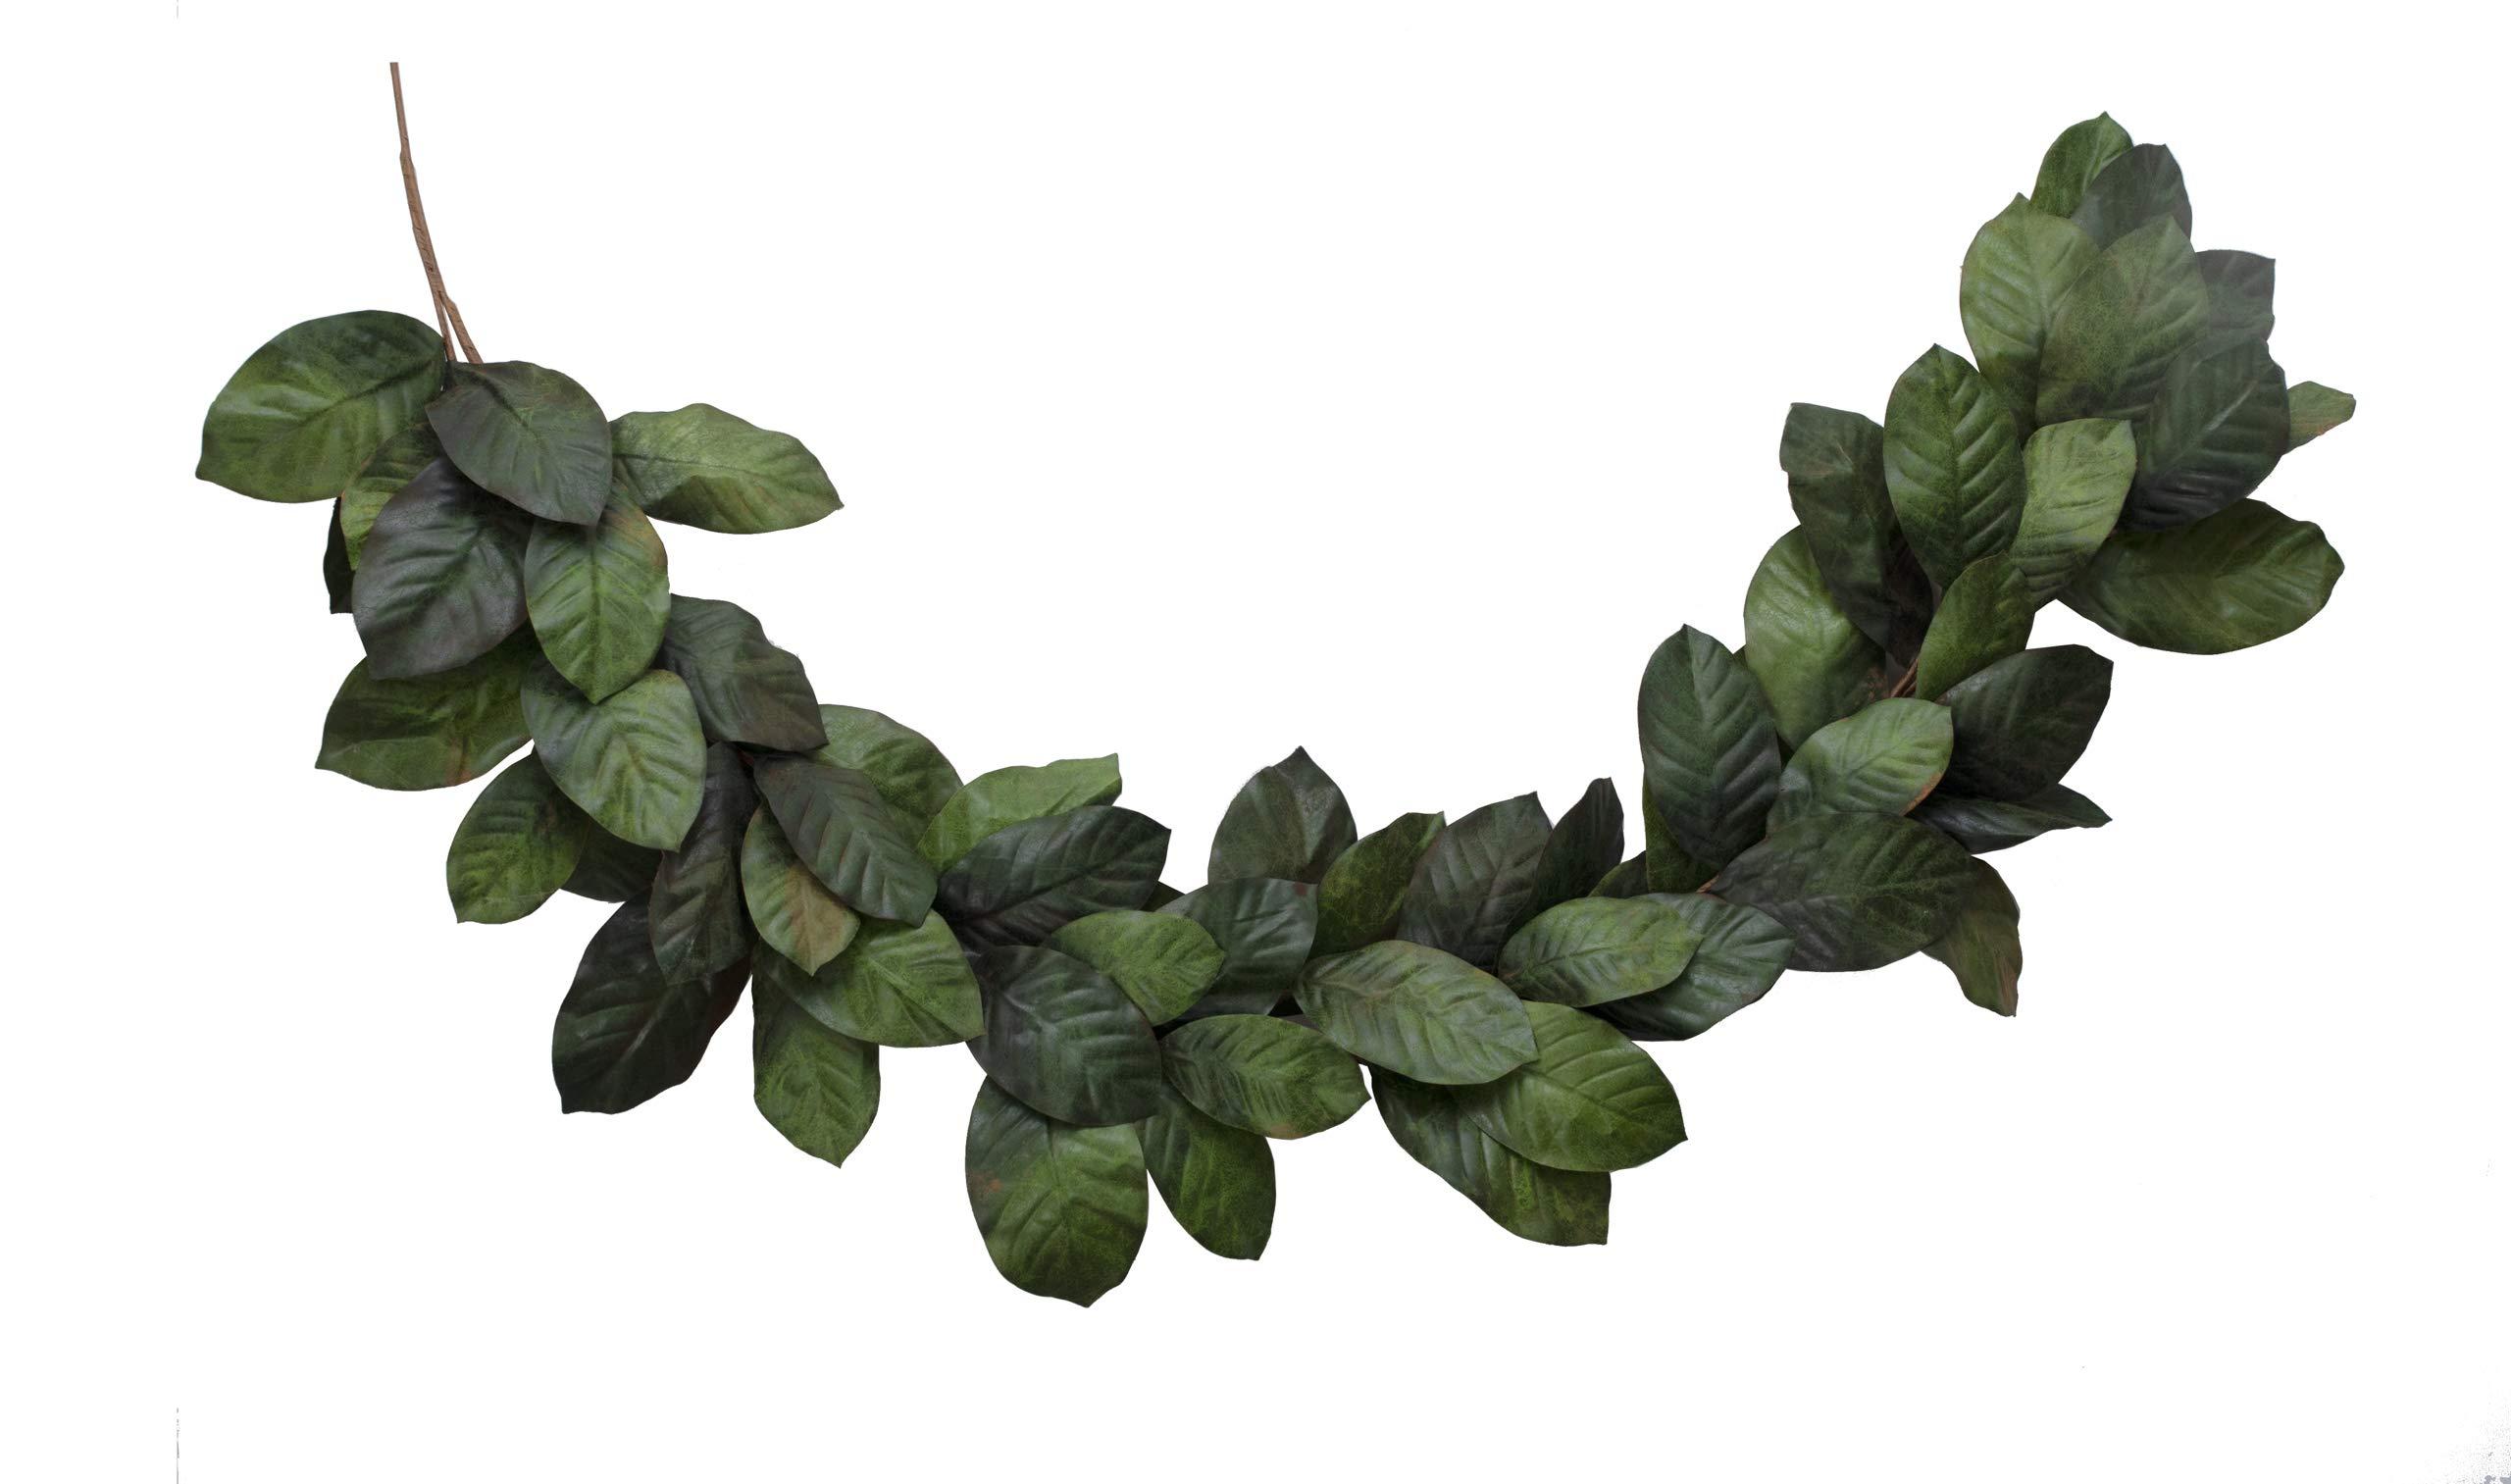 Vita Domi 6 Foot Magnolia Leaf Garland 2 Tone Green (VTD-ABF-NF2002)